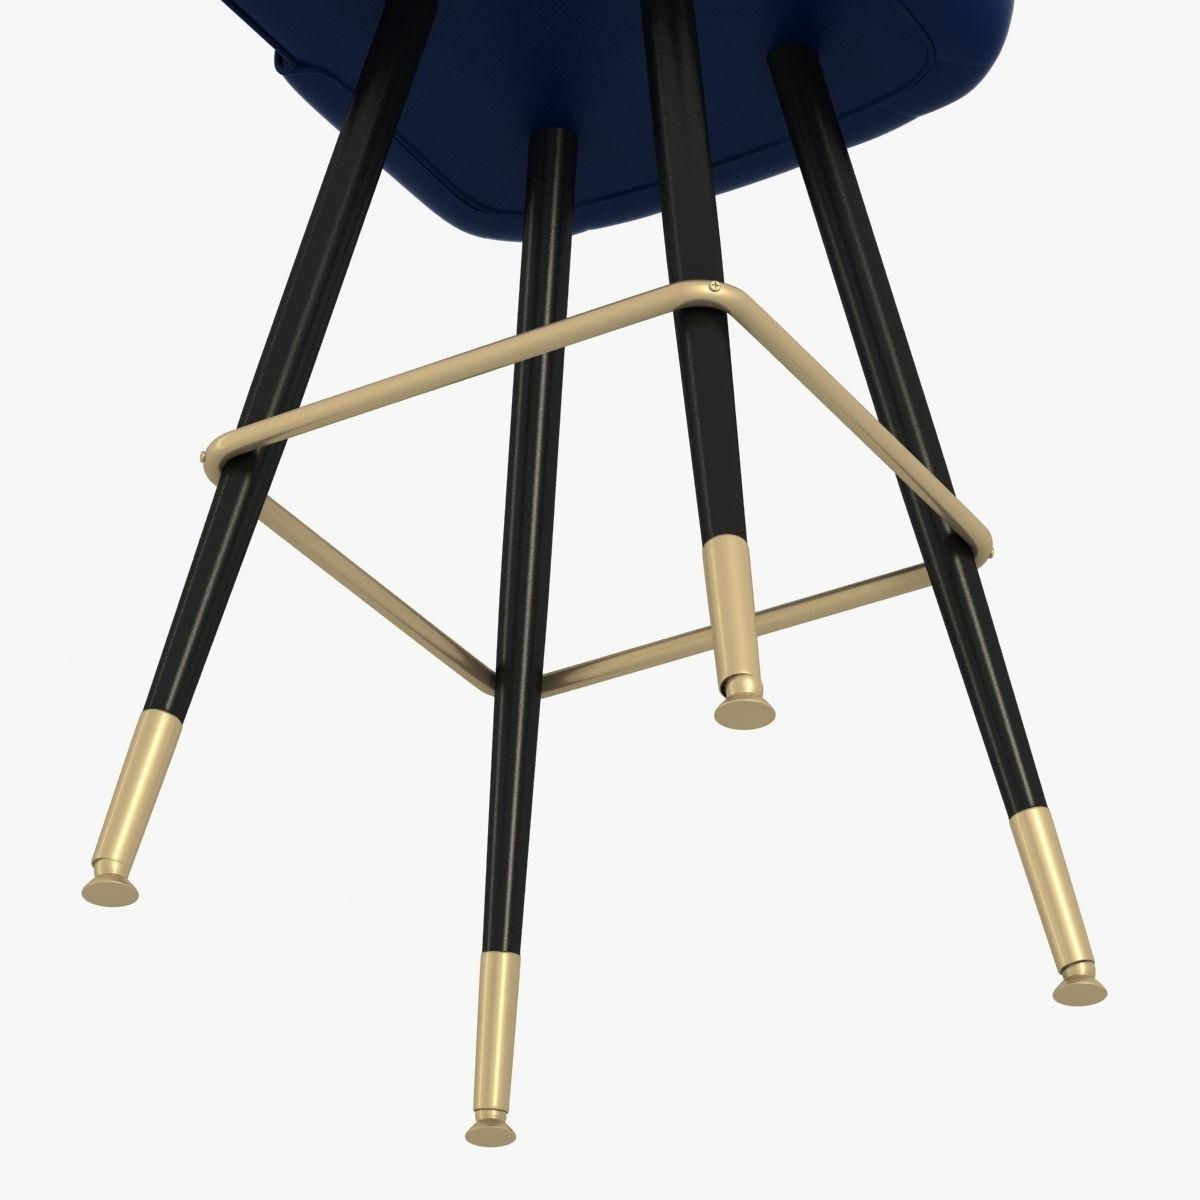 Richardson Seating Bar Stool 3d Model Max Obj 3ds Fbx